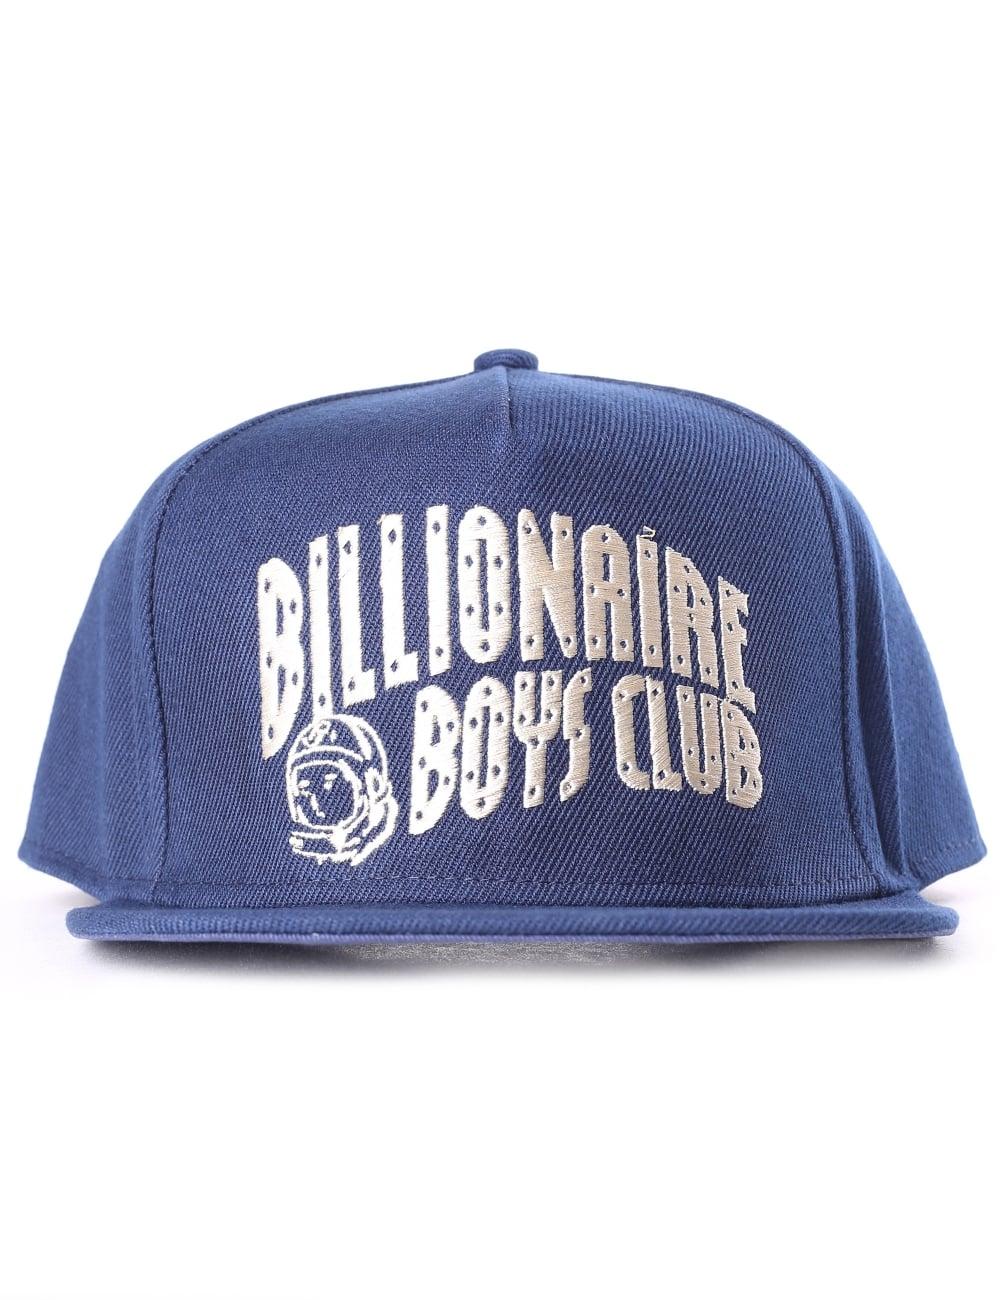 3c662b01b3f20 greece baseball cap trucker hat billionaire boys club baseball cap 1ae99  62e17  promo code mens arch logo snapback cap 408fd 2db6c